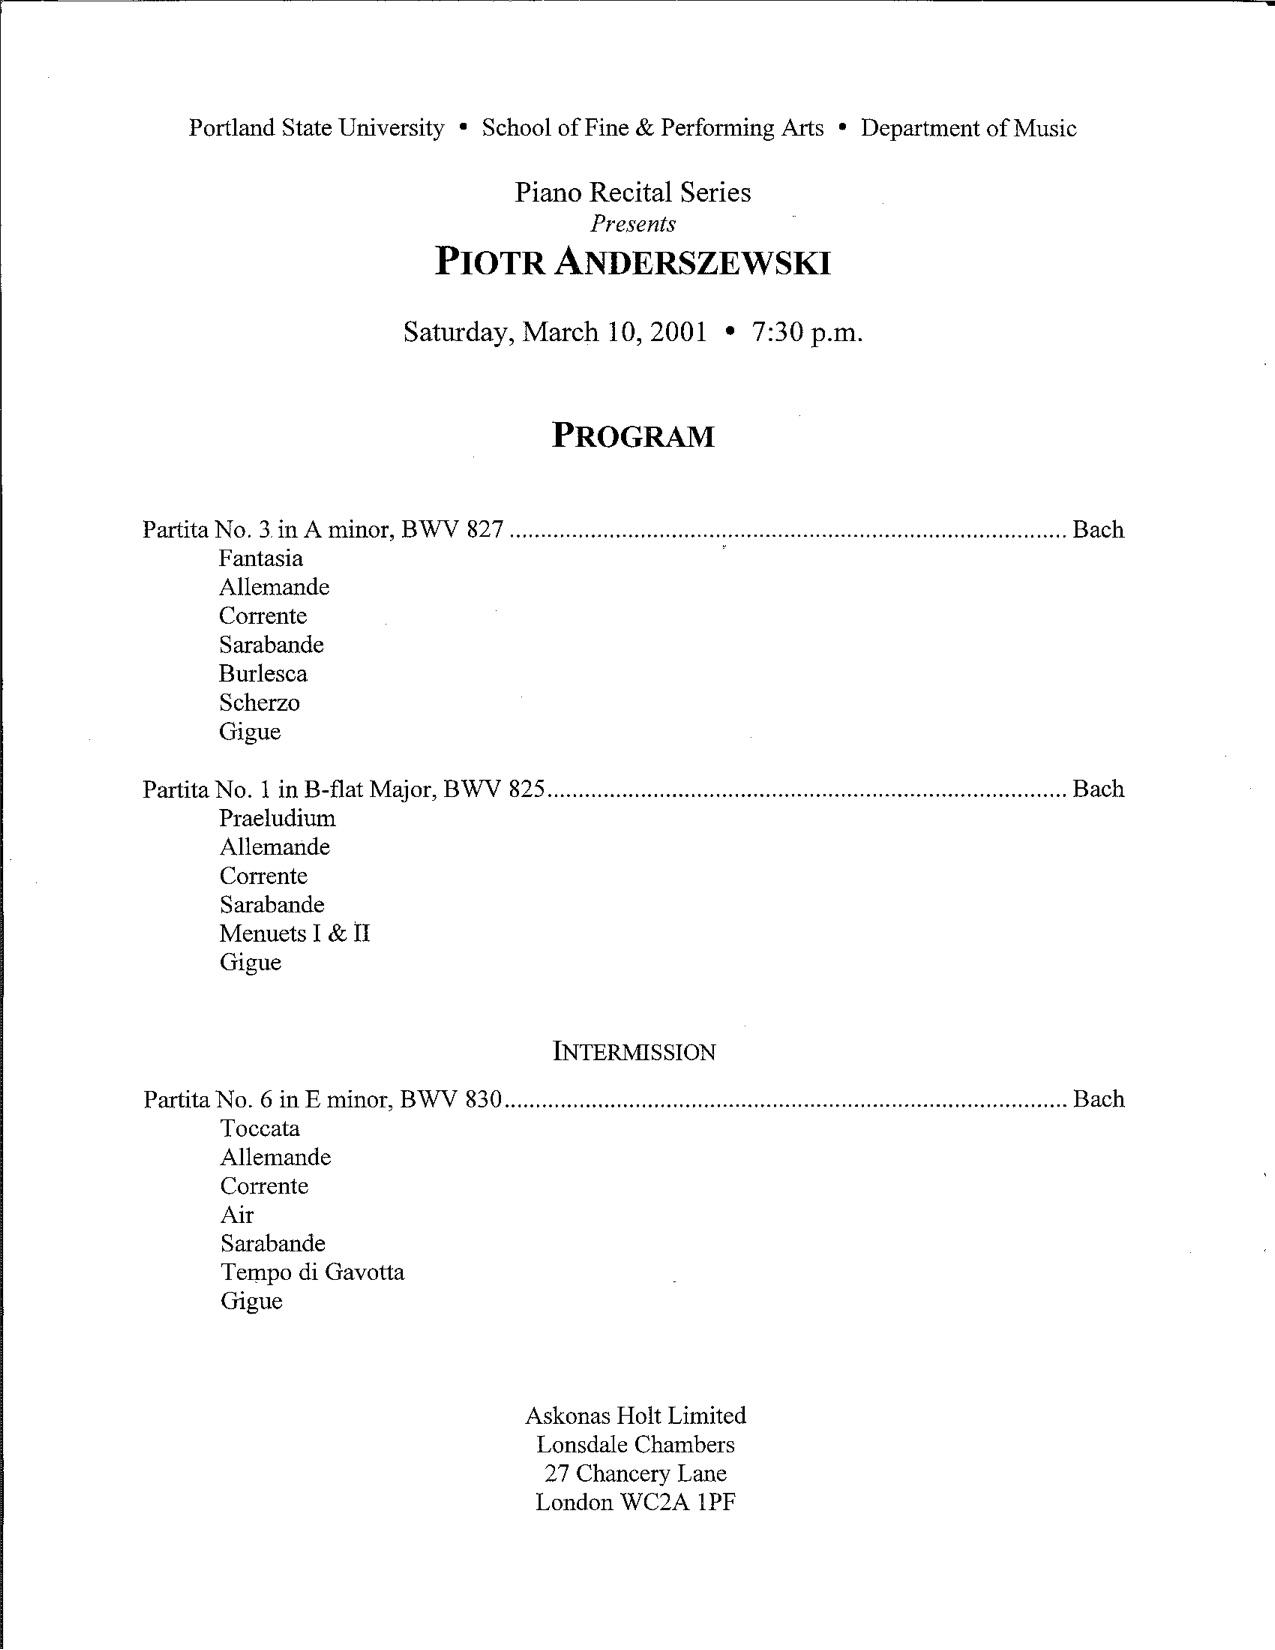 Anderszewski00-01_Program2.jpg